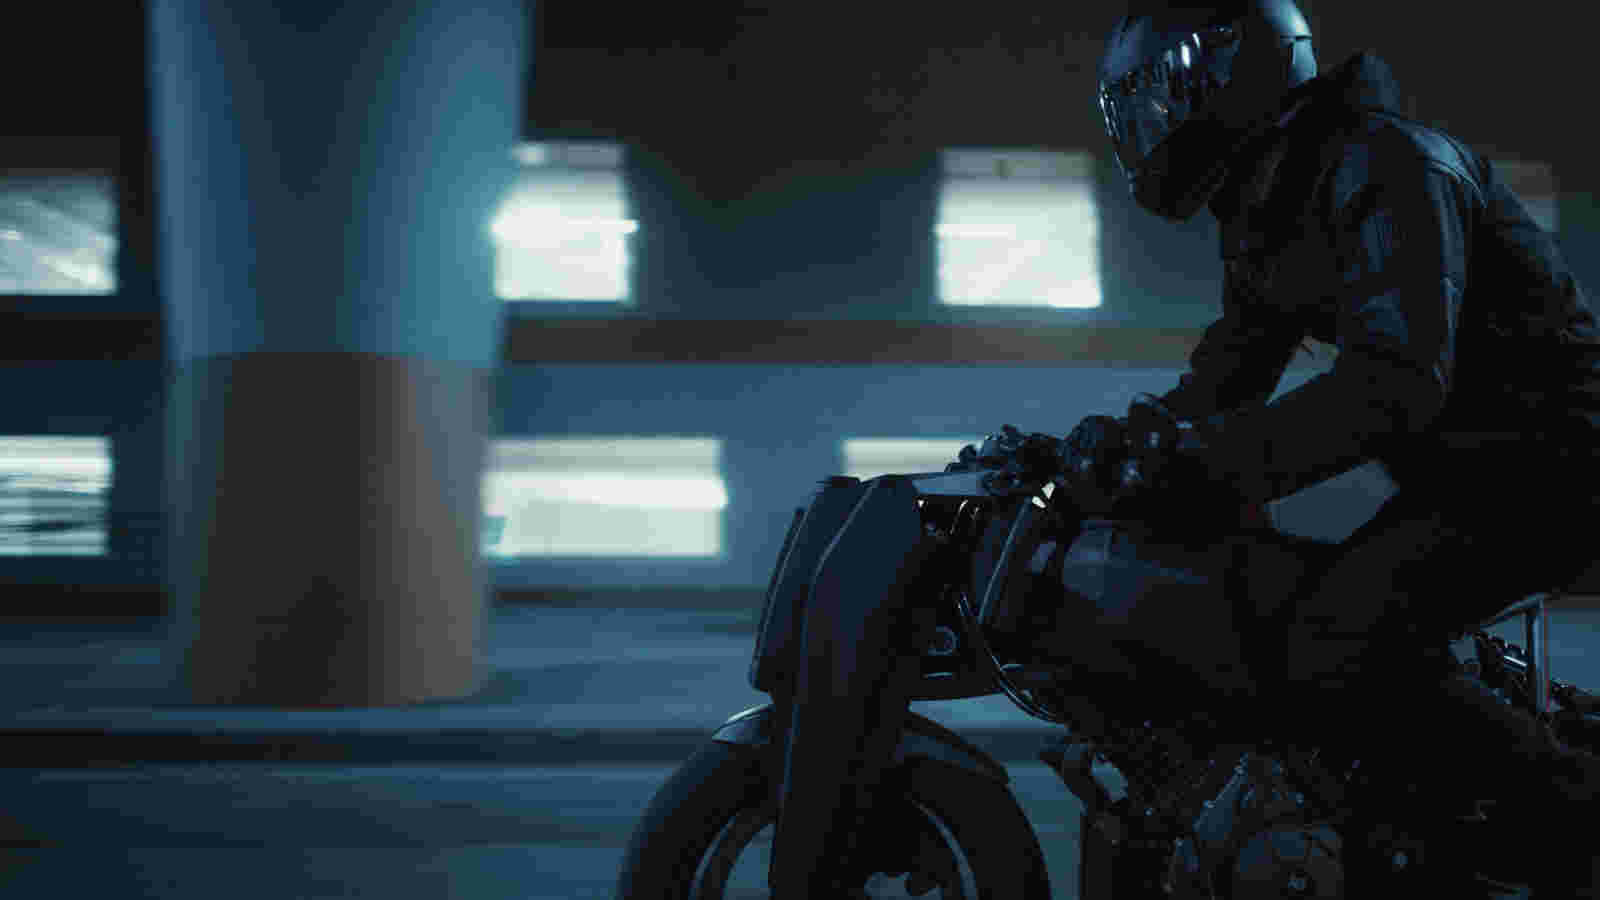 Deanbradshaw Ronin Motorcycle9